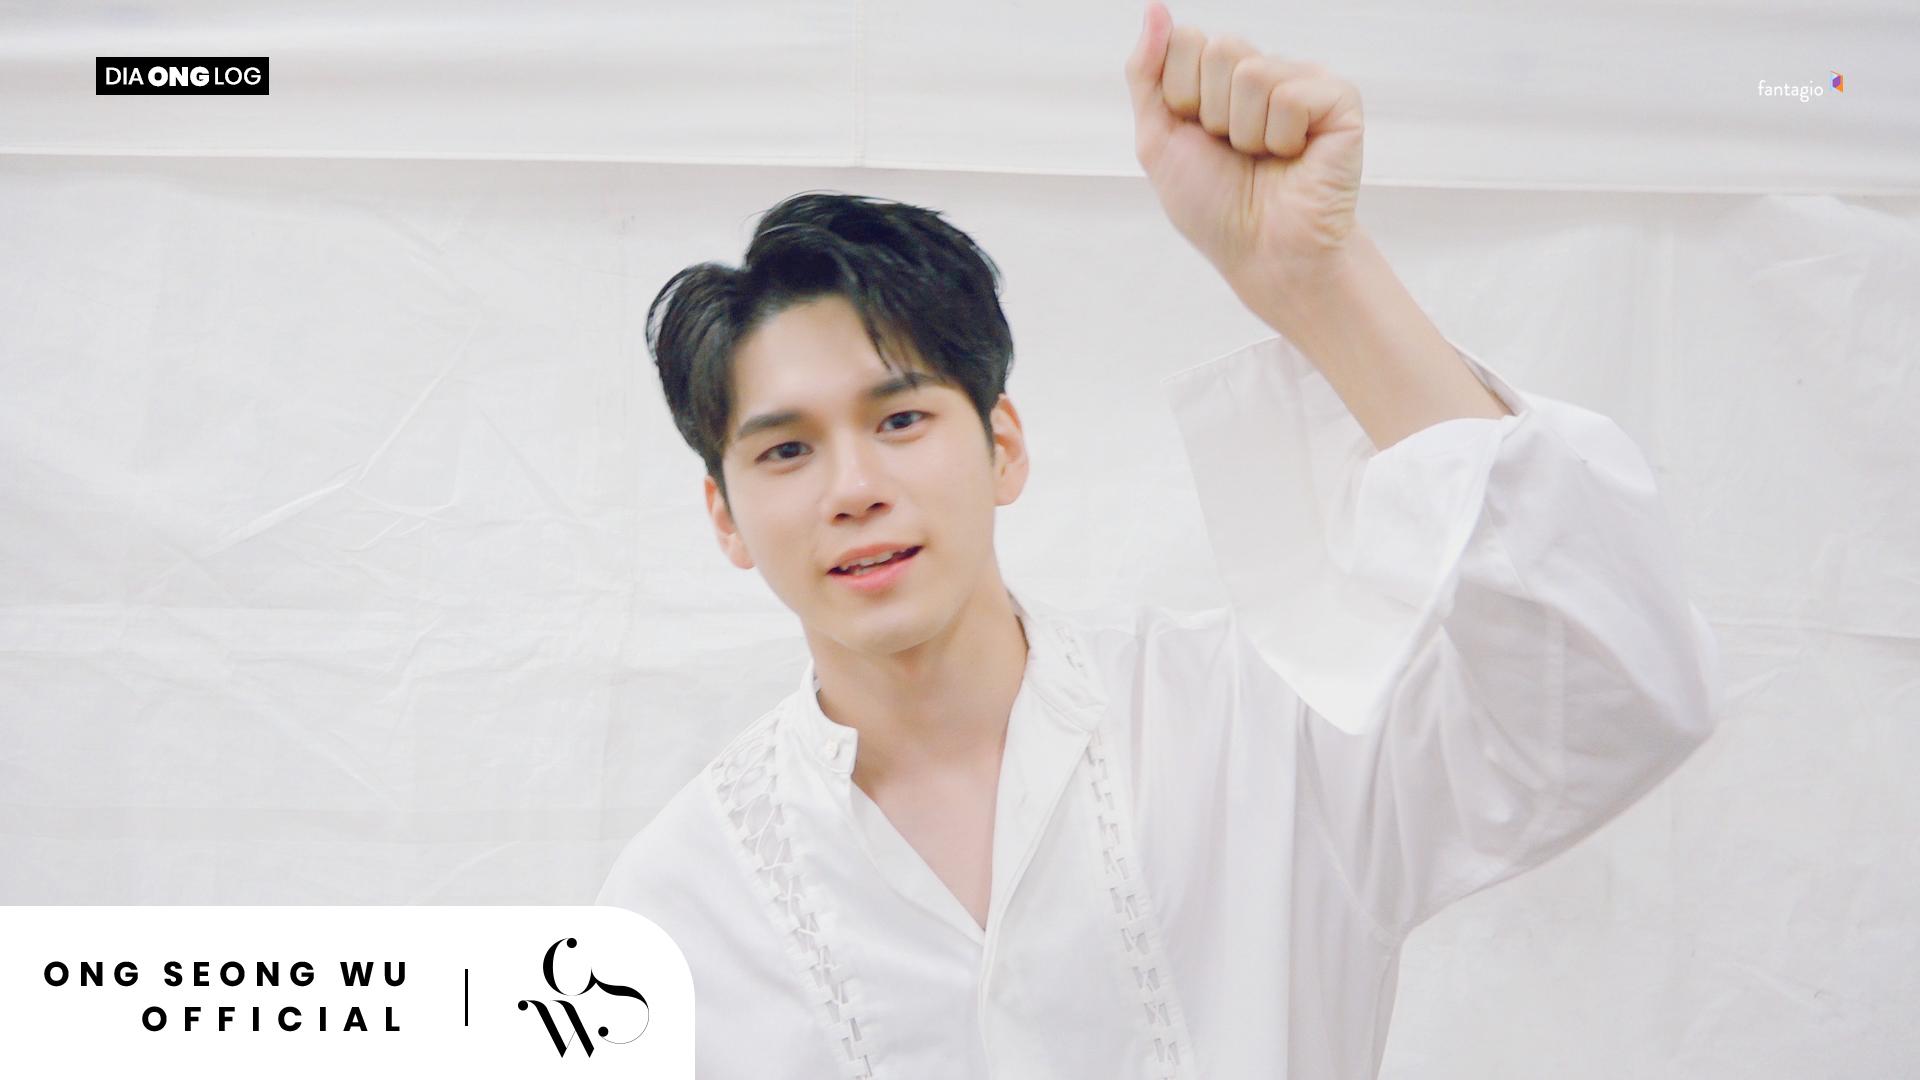 ONG SEONG WU 옹성우 - [diaONGlog] 펩시 콘서트 비하인드